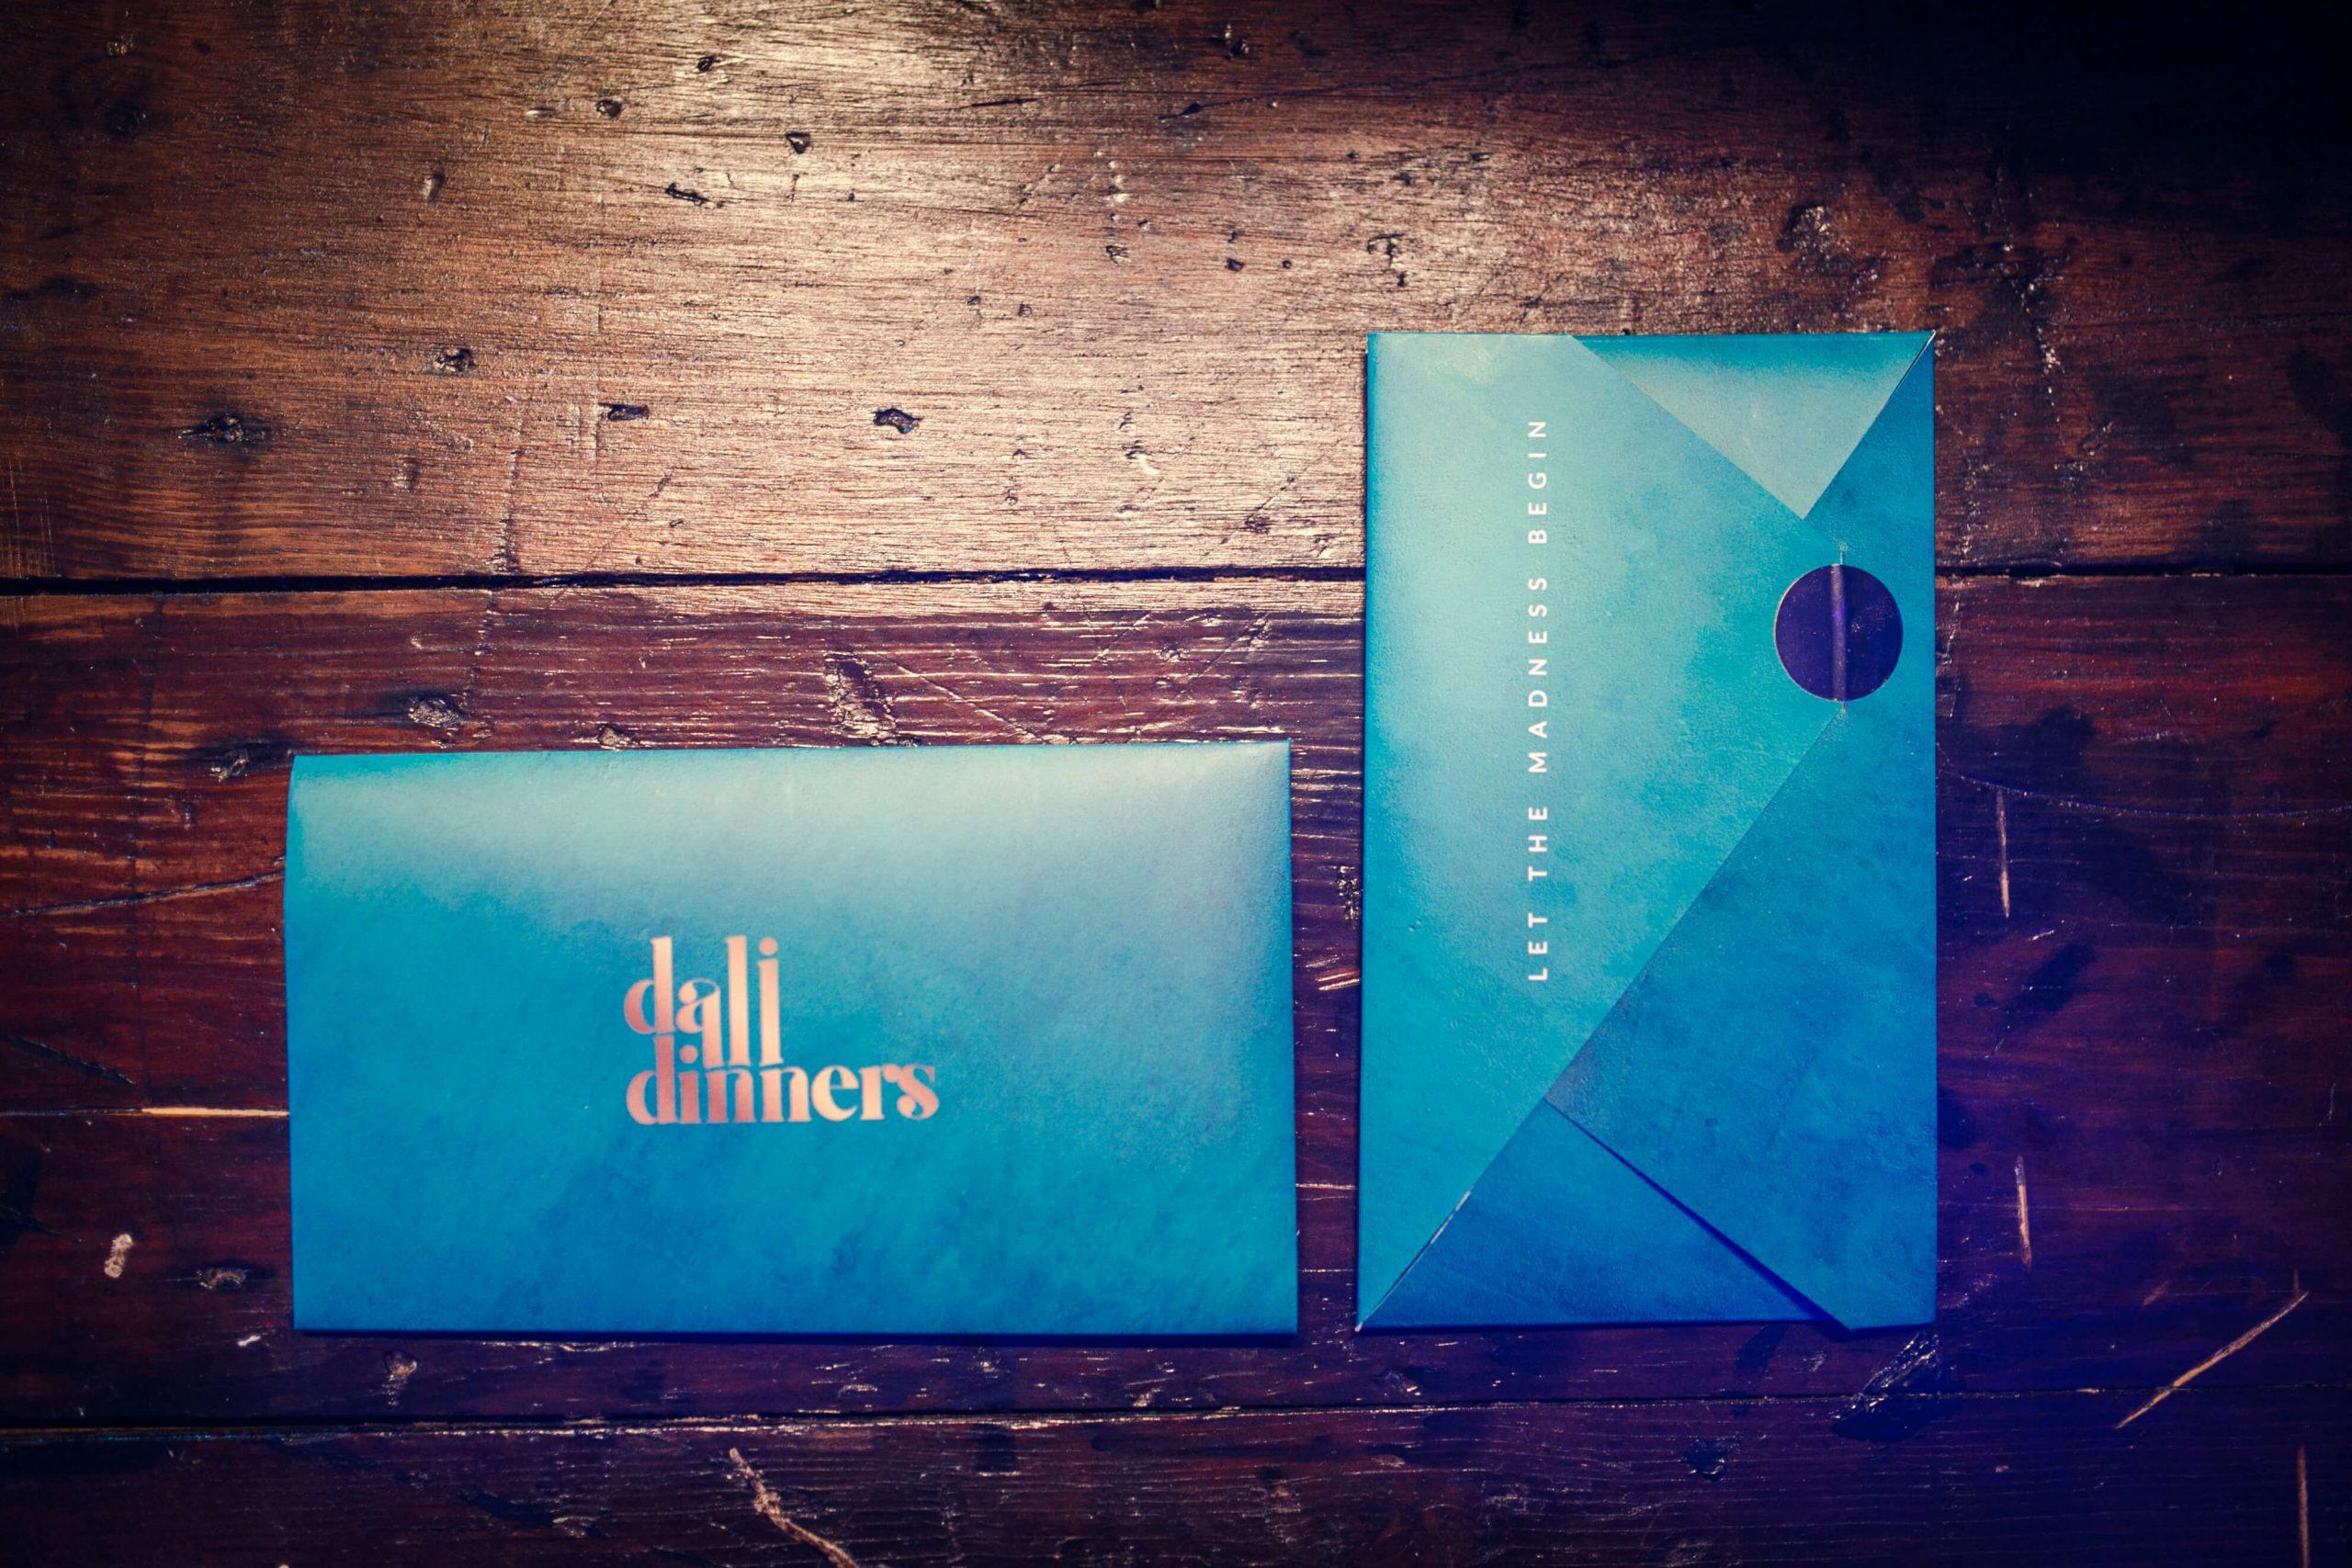 The MAD - Dali Dinners - azanhastudio-011